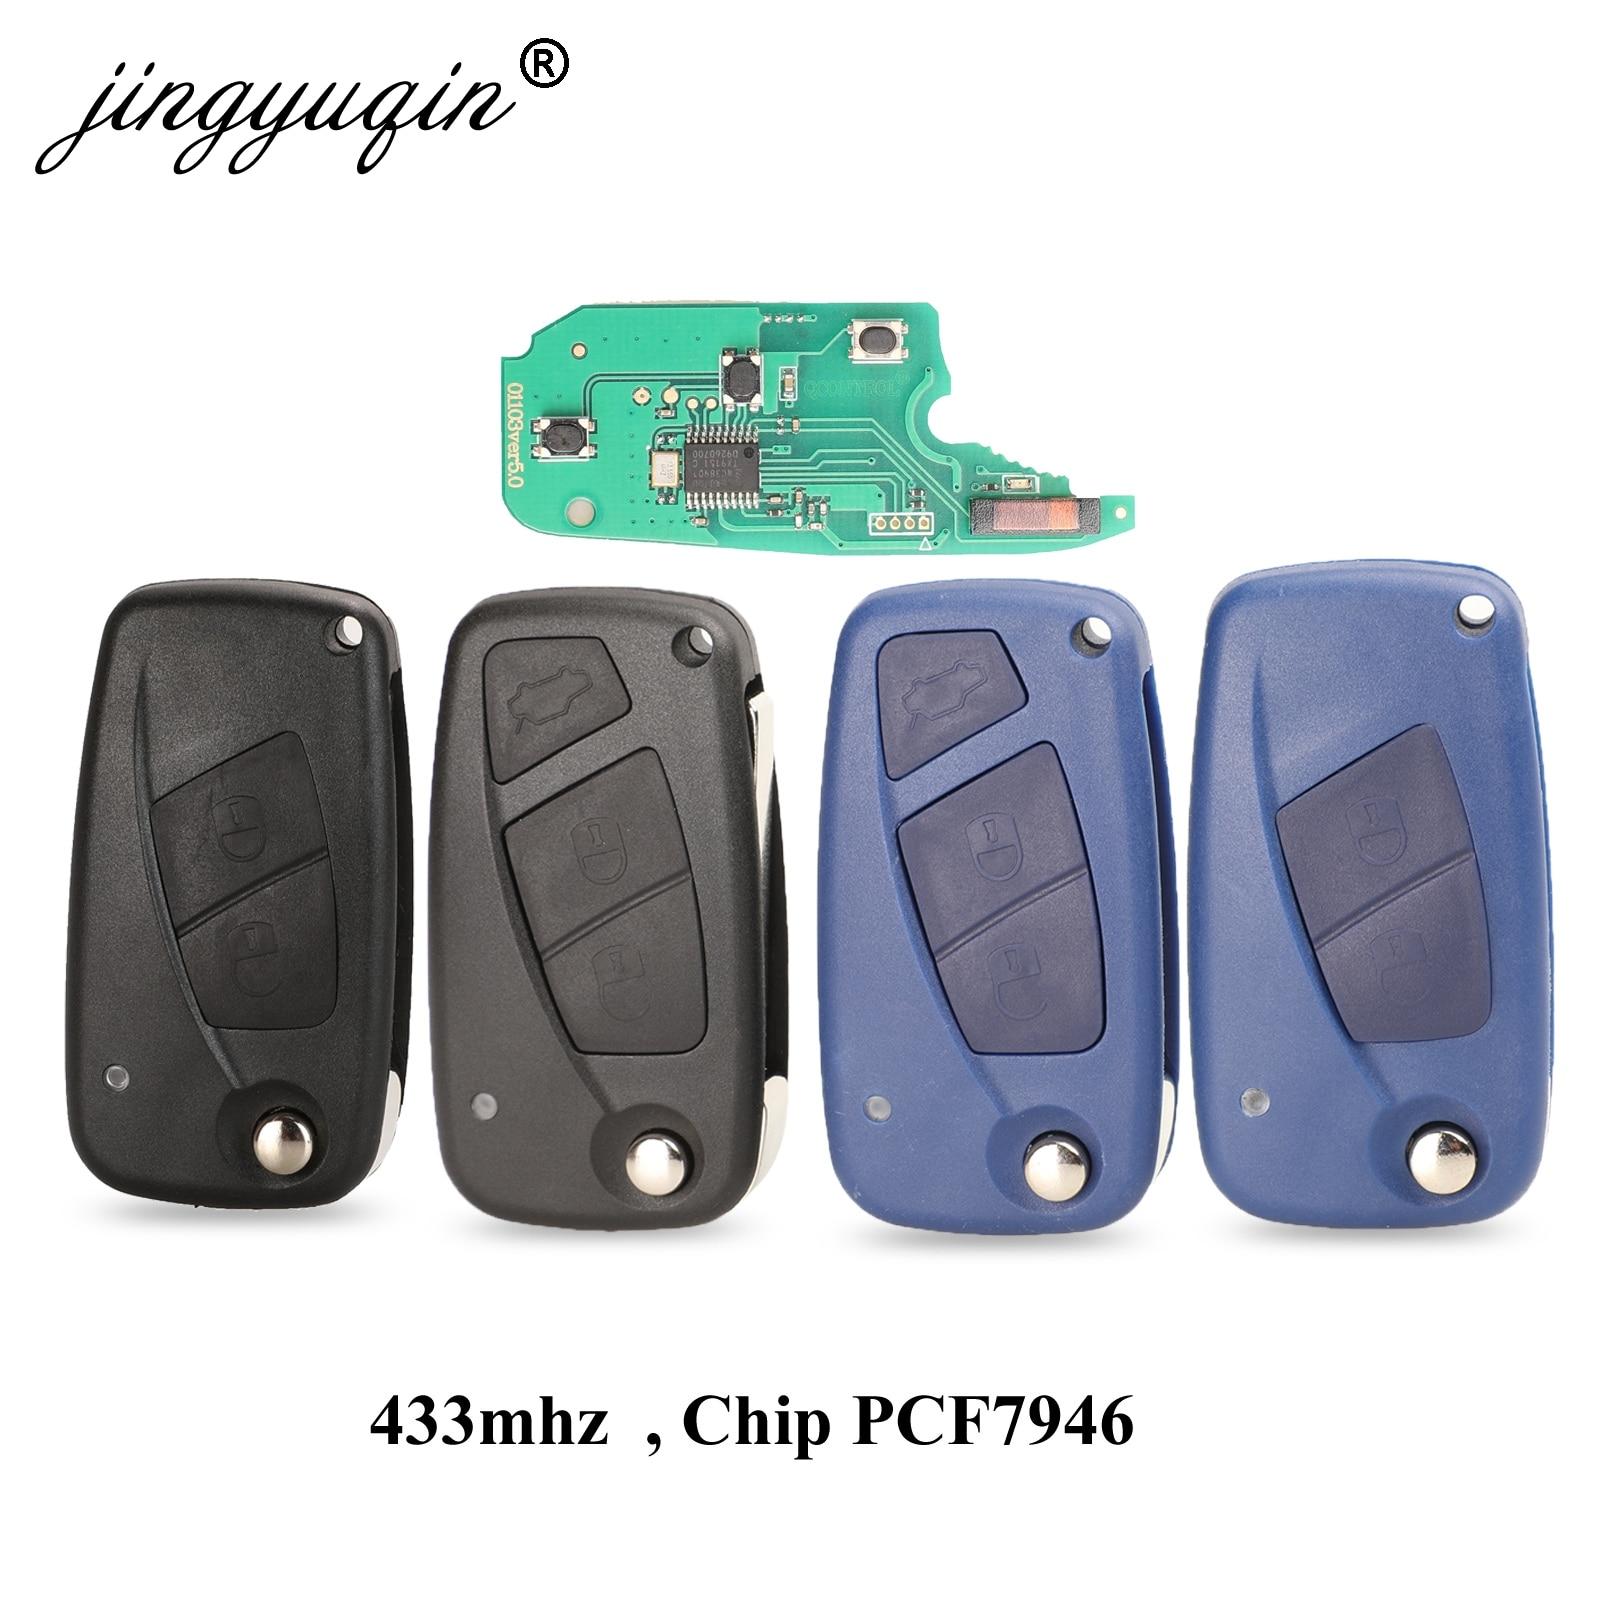 Jingyuqin 2 / 3 кнопки дистанционного ключа Delphi система 433 МГц для FIAt 500 Punto Ducato Stilo Panda Bravo ключ ID46 PCF7946 / 7941 чип